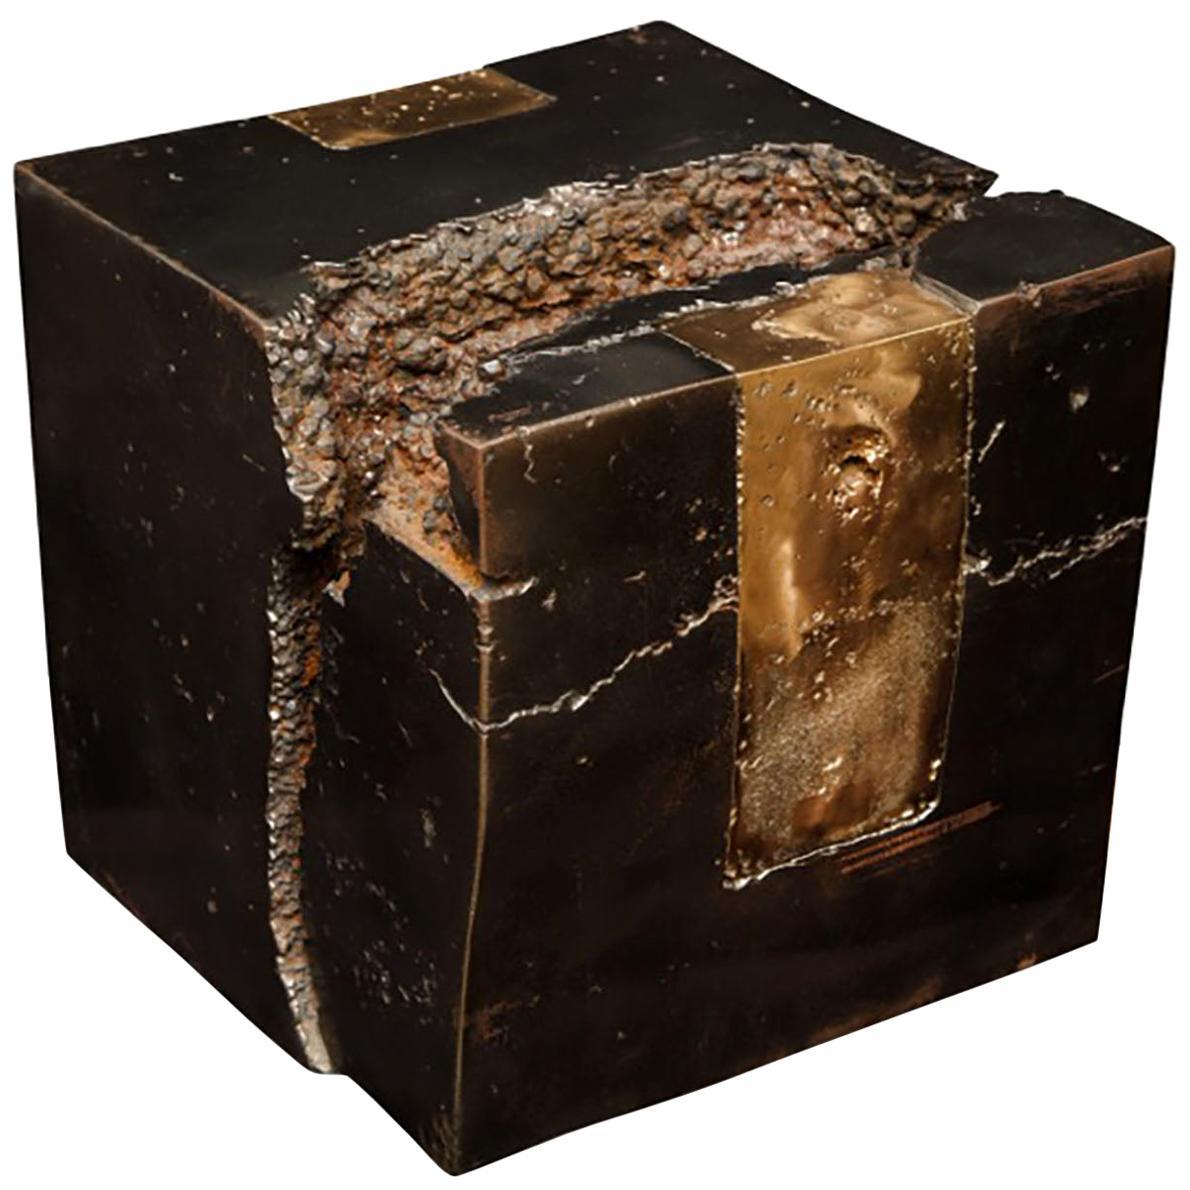 Bronze Cube Shaped Sculpture